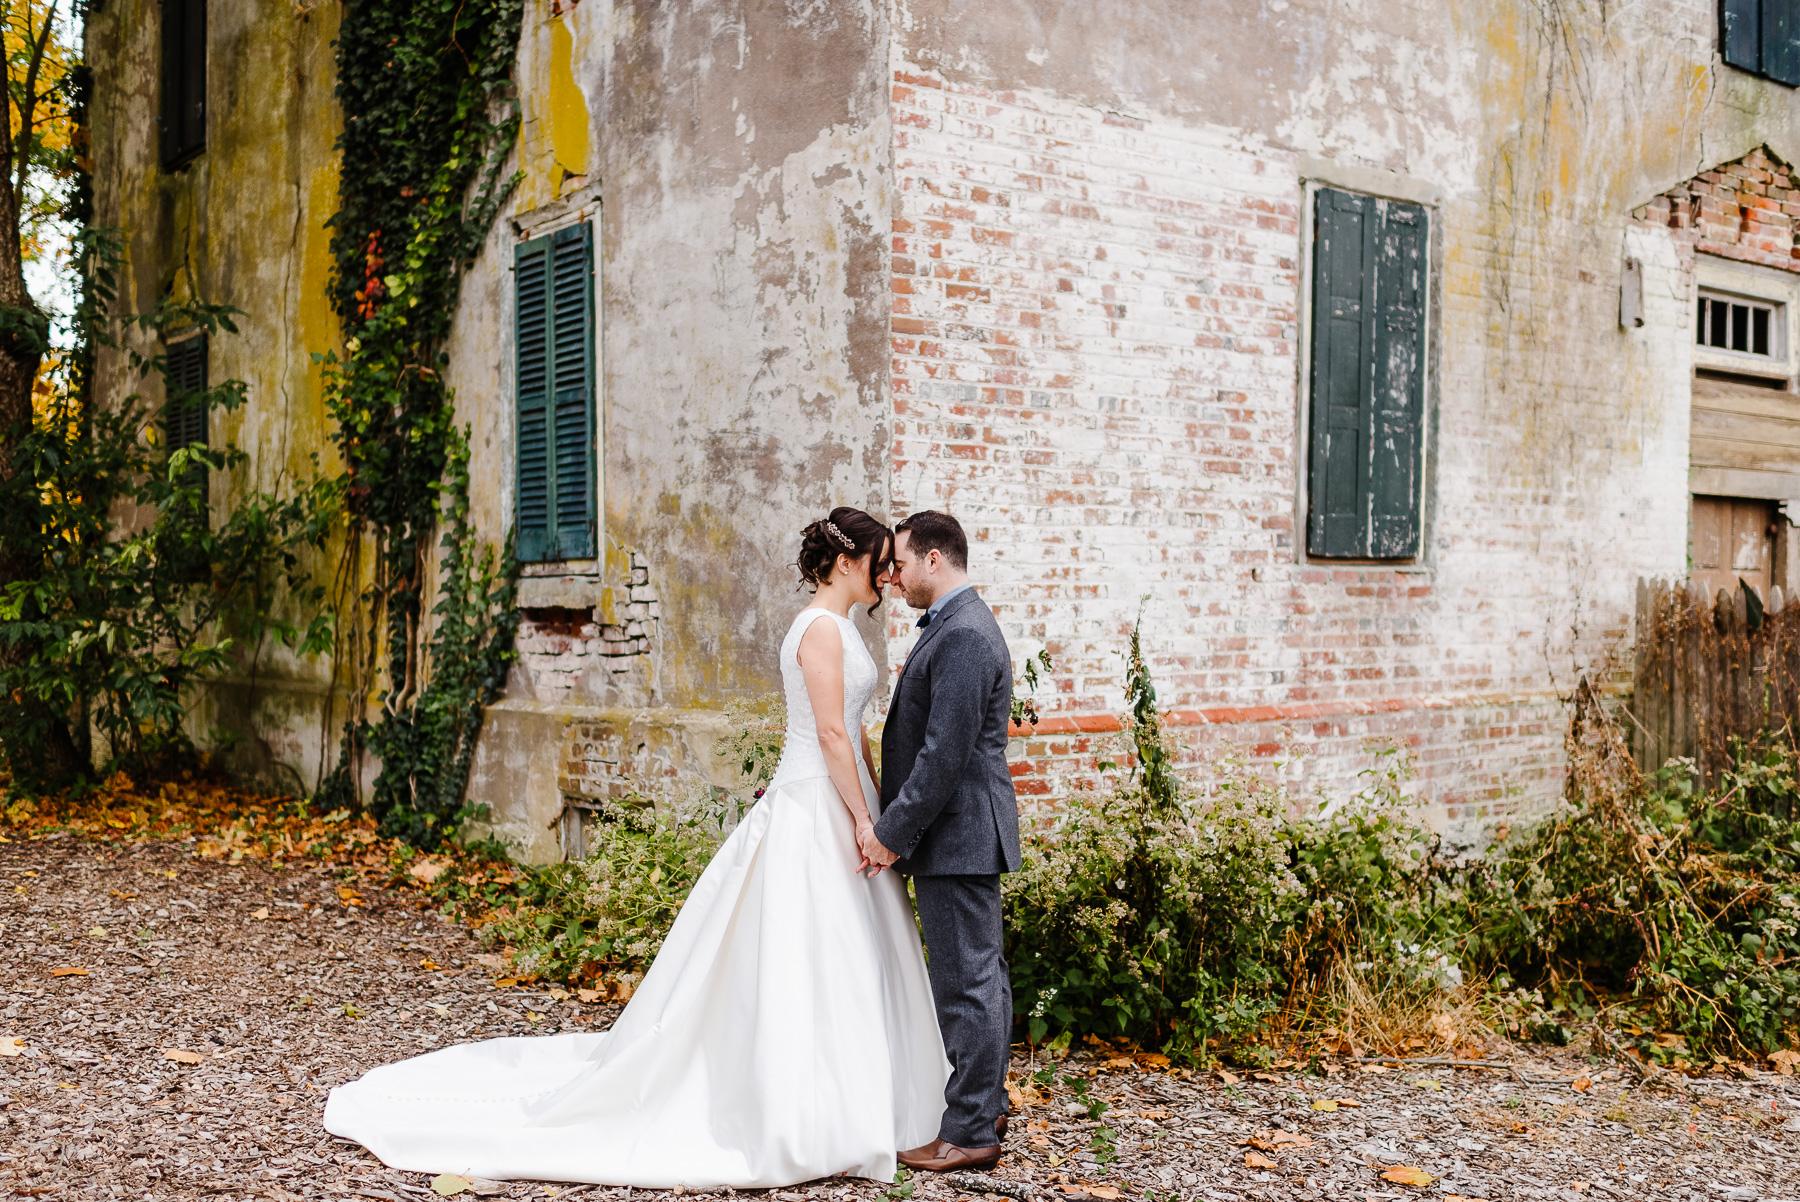 26-Laurita Winery Wedding New Jersey Wedding Photographer Laurita Winery Weddings Longbrook Photography.jpg